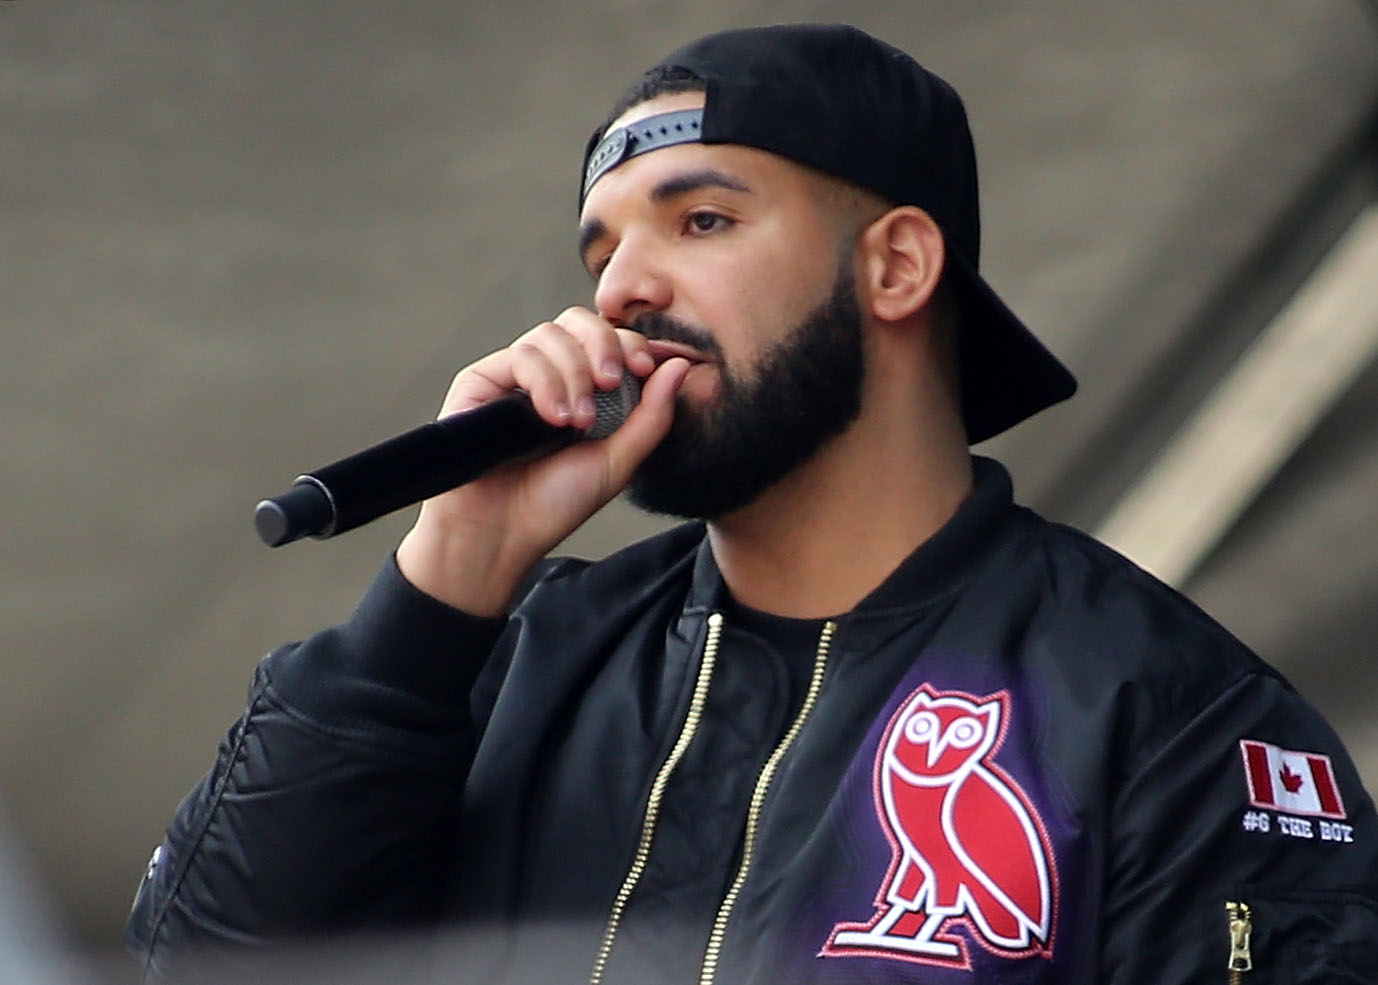 Drake Secures Creative Partnership With SiriusXM Pandora